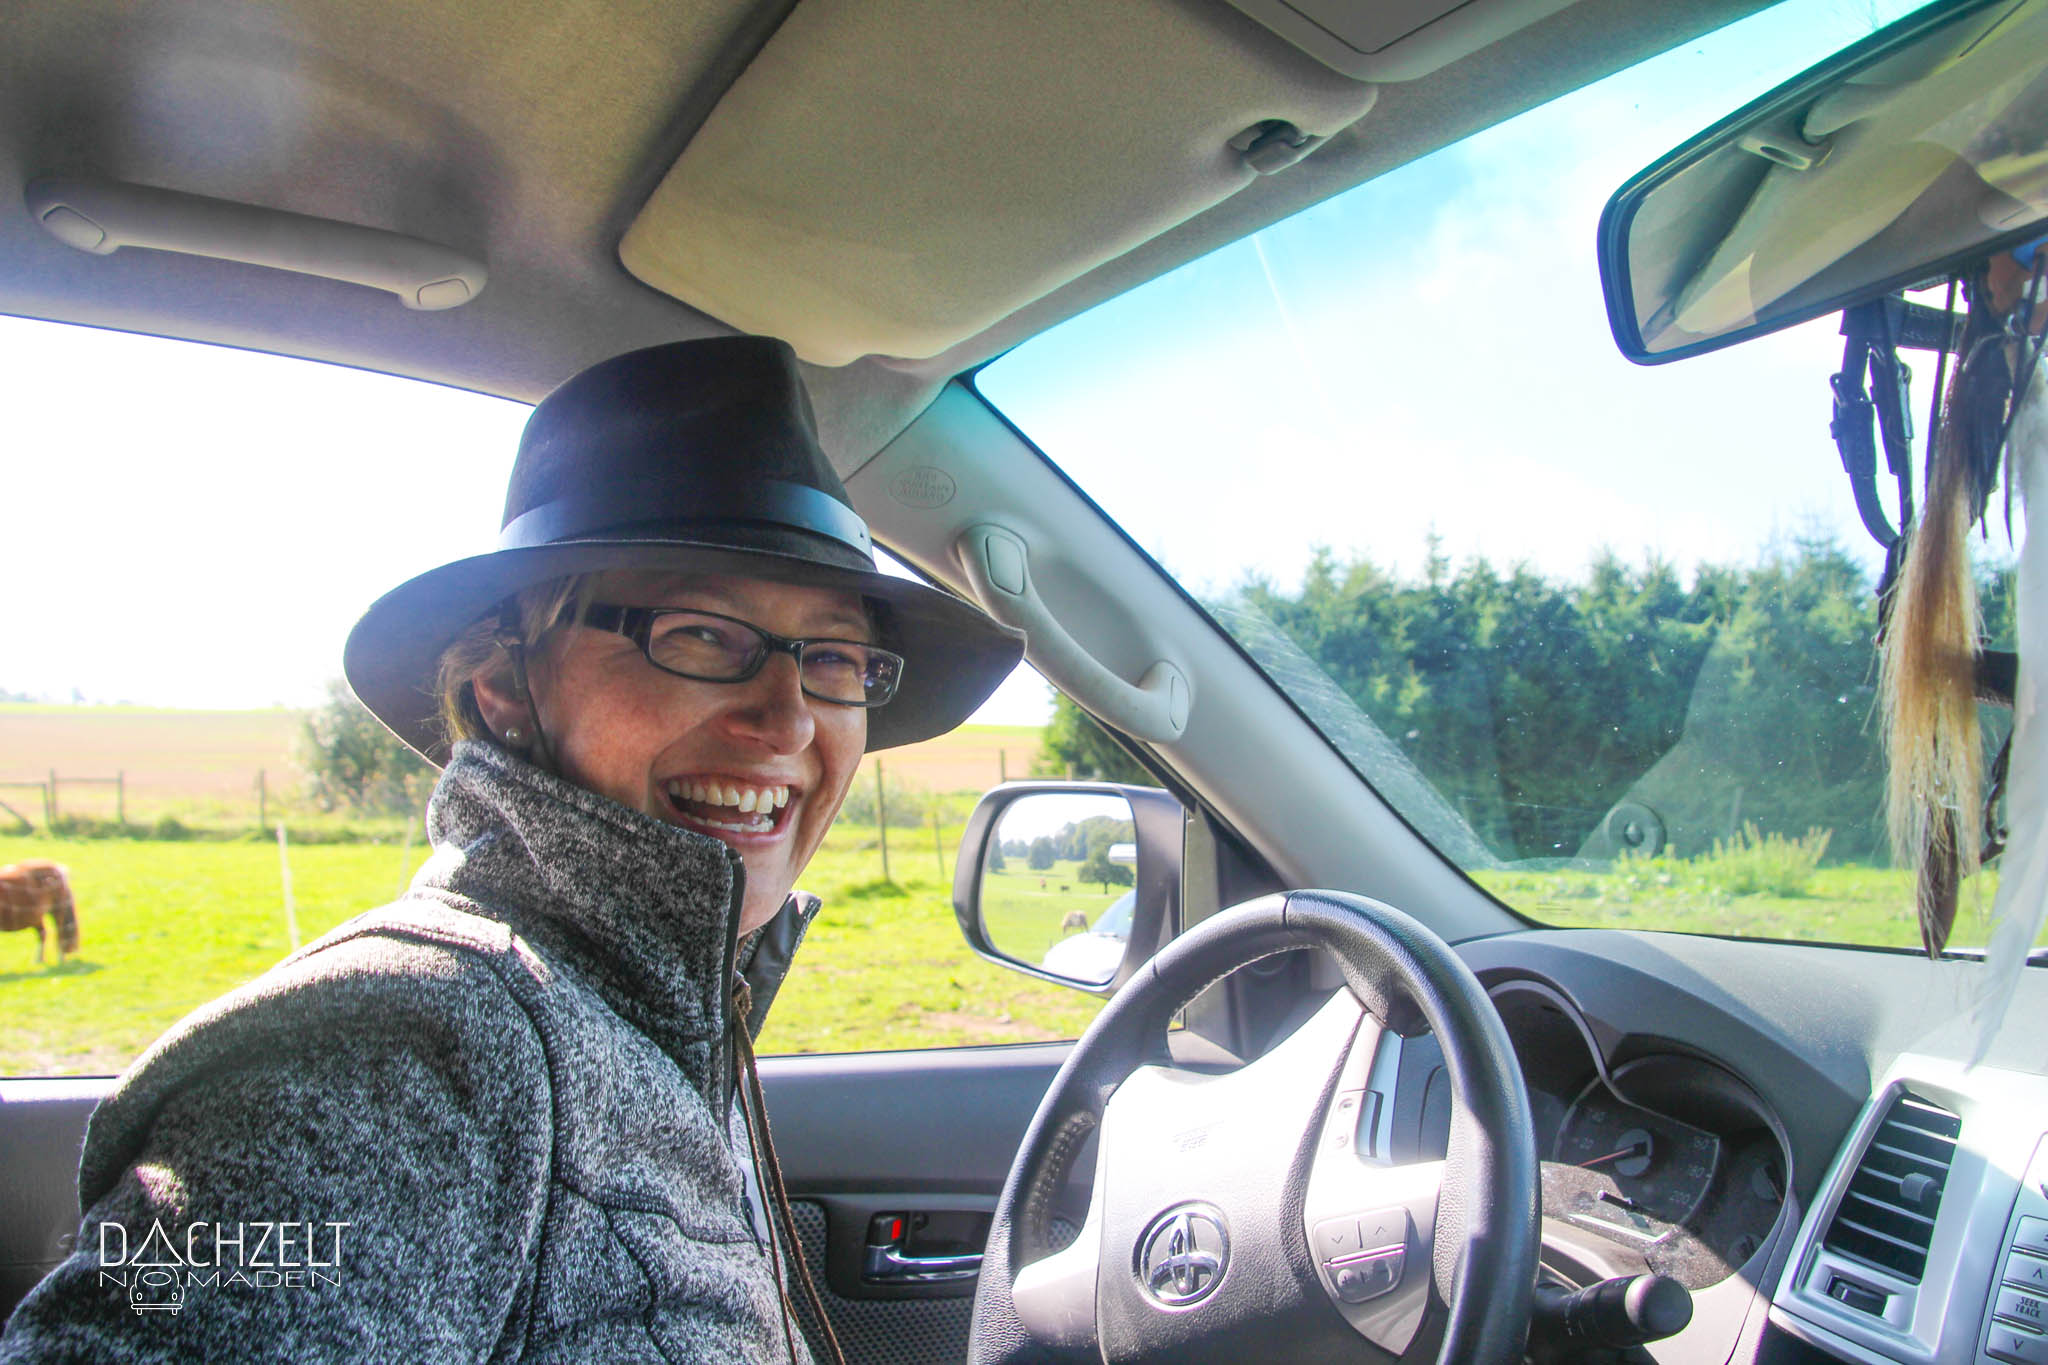 Dachzeltnomadentreffen-2017 Offroad Birgit Hofmann 1755